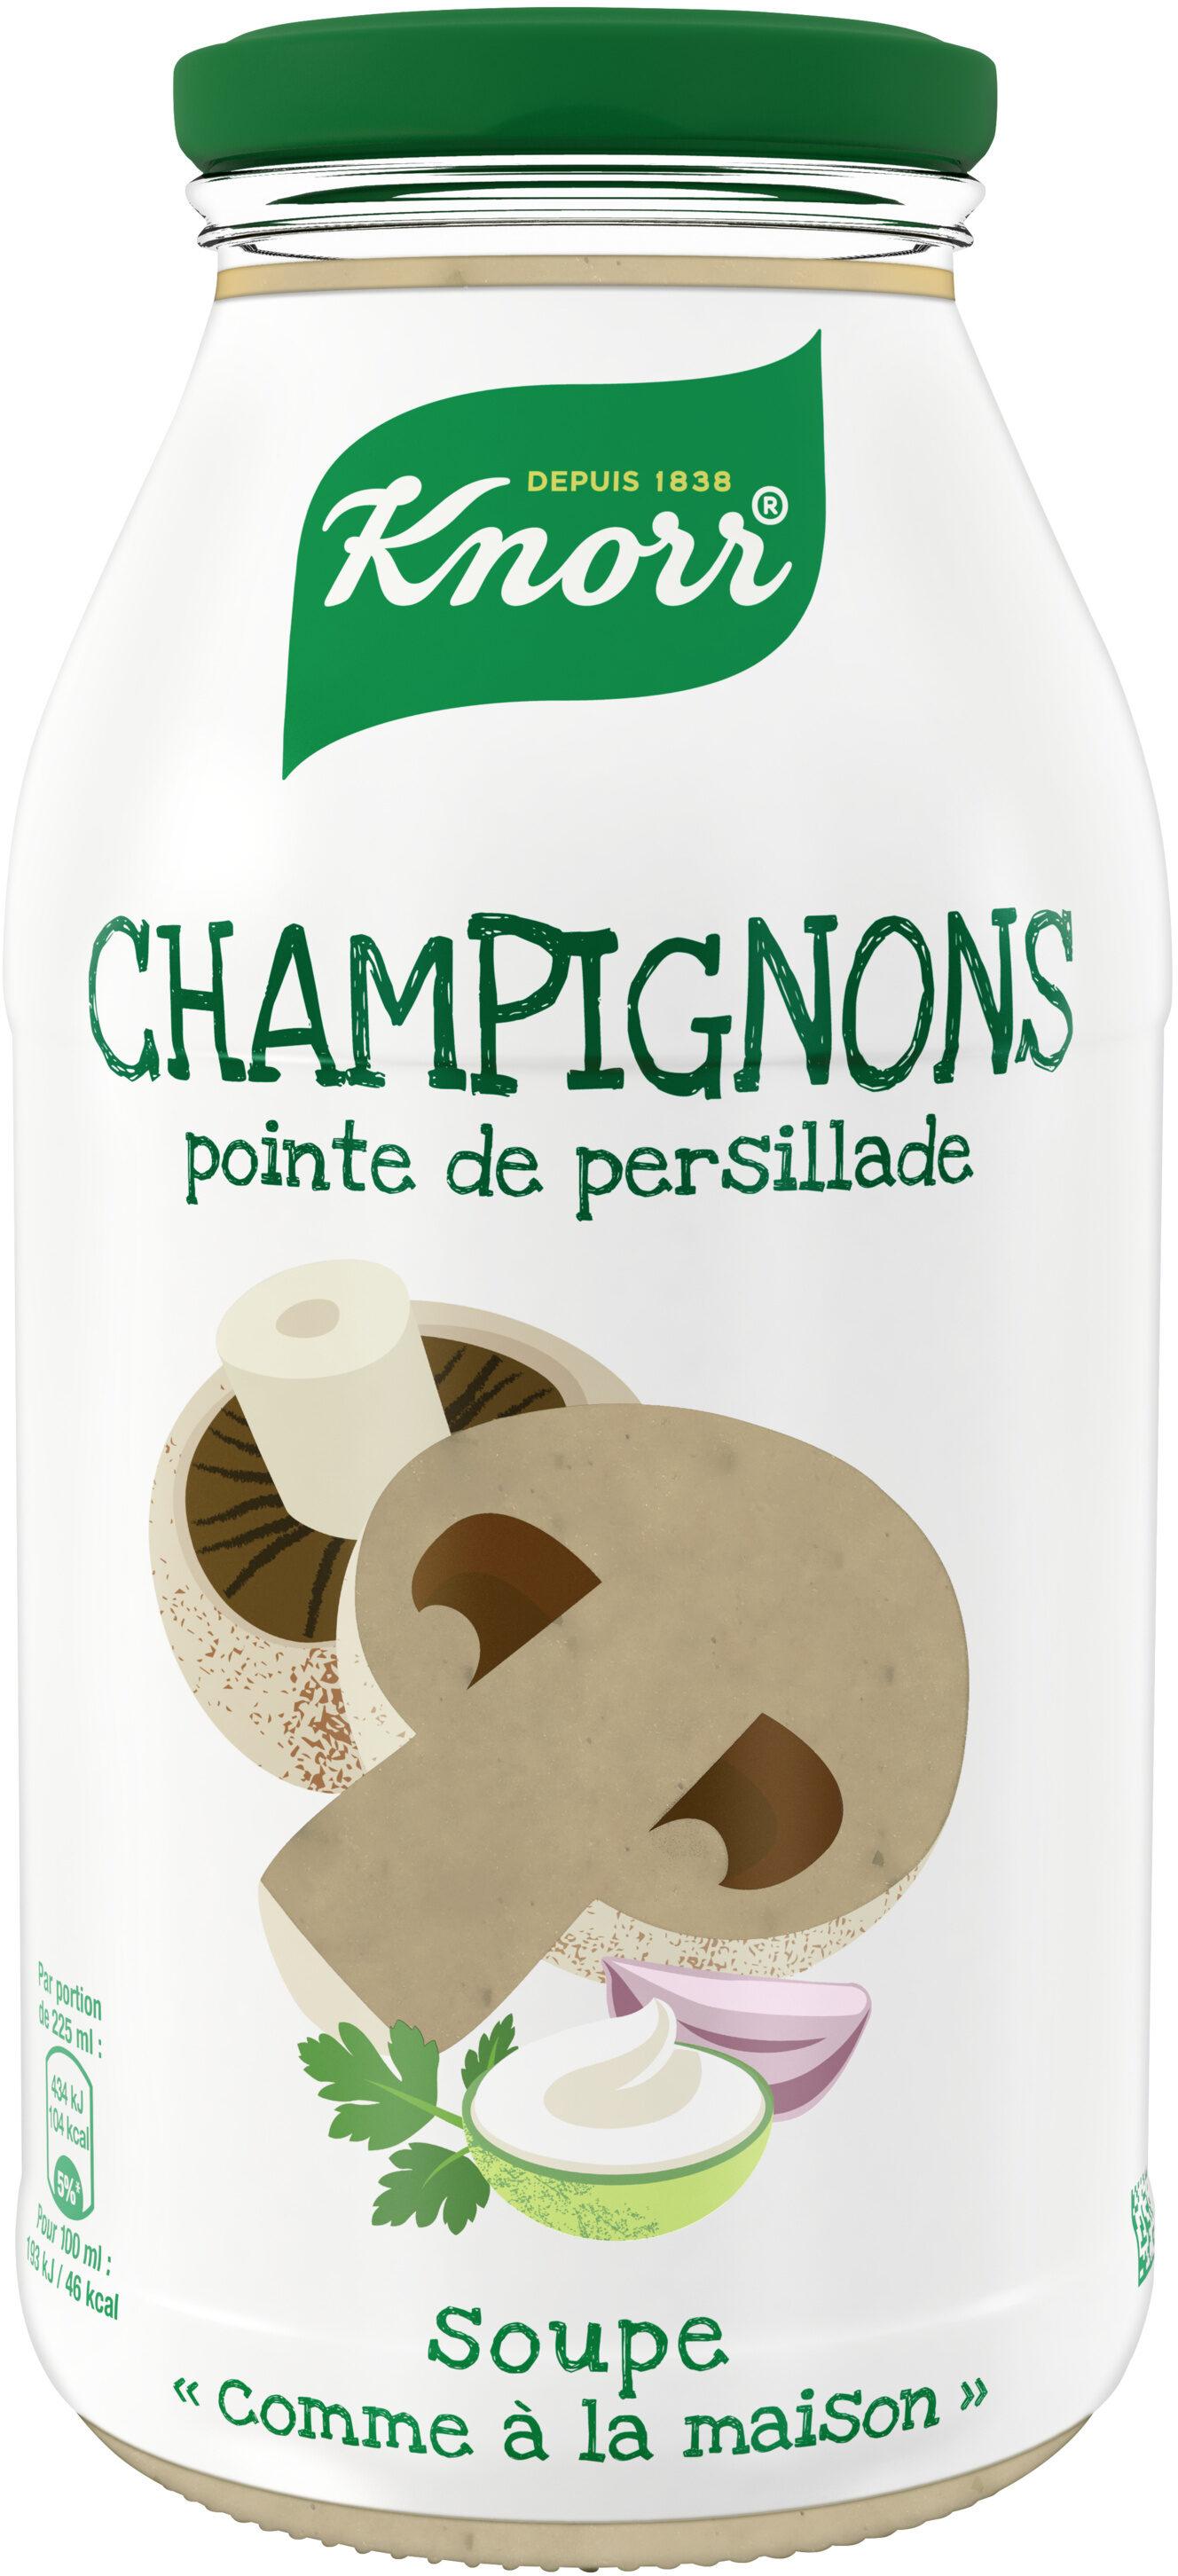 Knorr Soupe Bouteille Champignons & Pointe de Persillade - Producto - fr